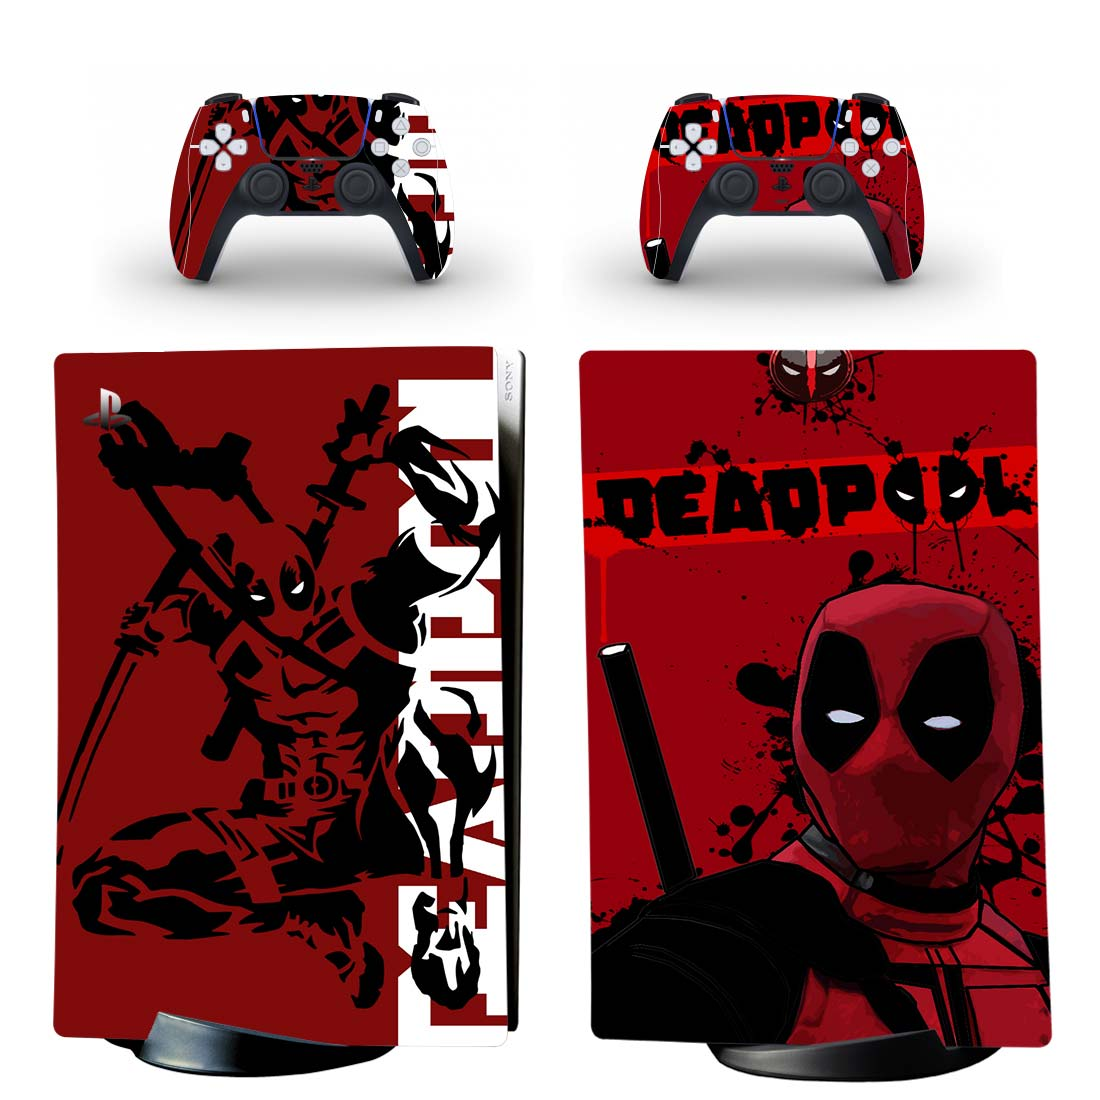 Deadpool PS5 Digital Edition Skin Sticker Decal Design 2